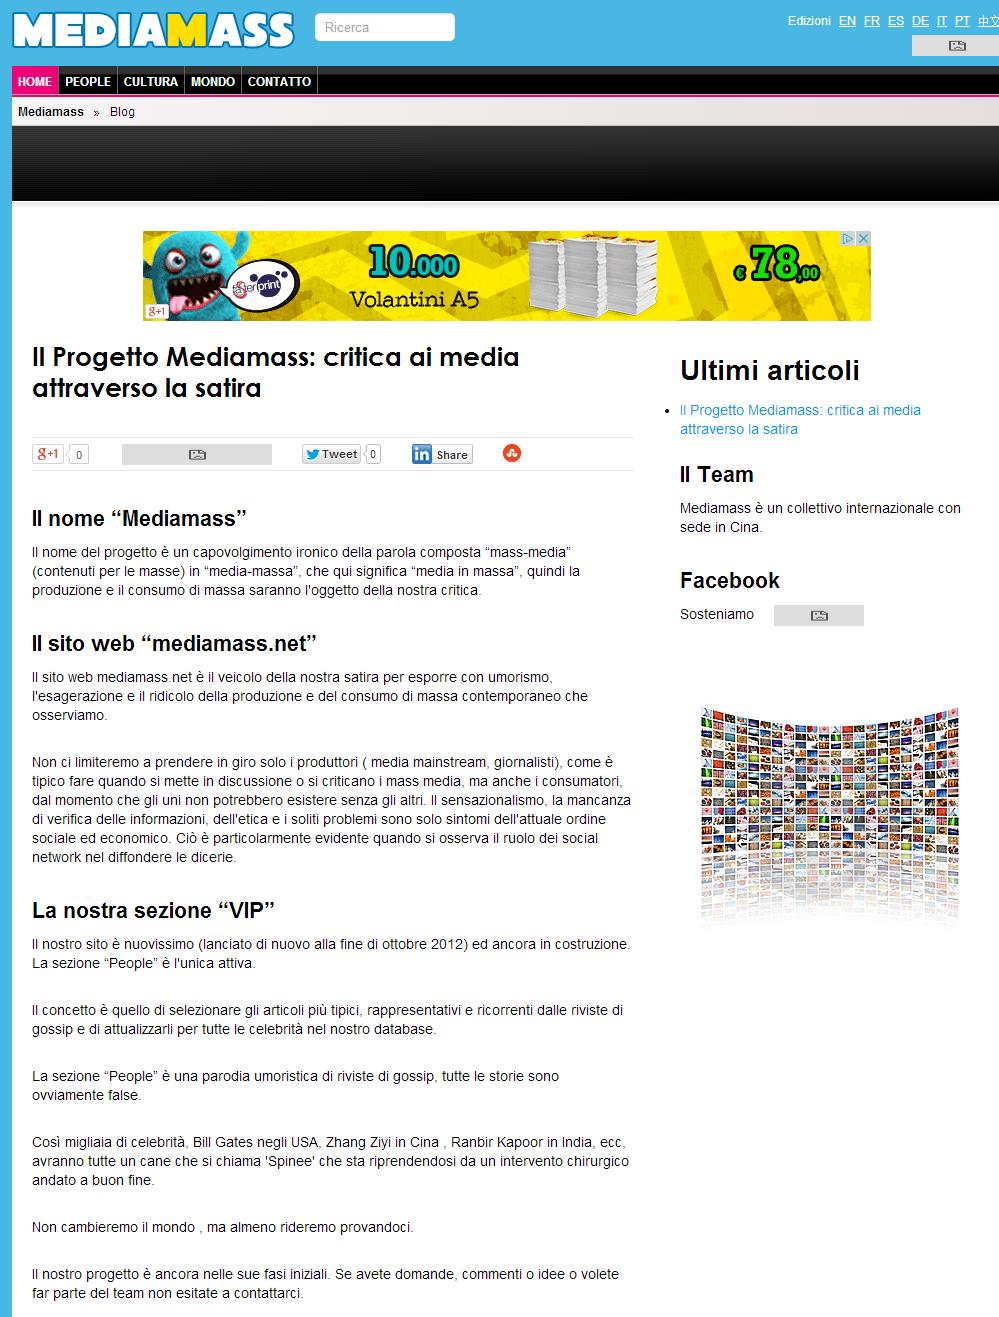 mediamass01